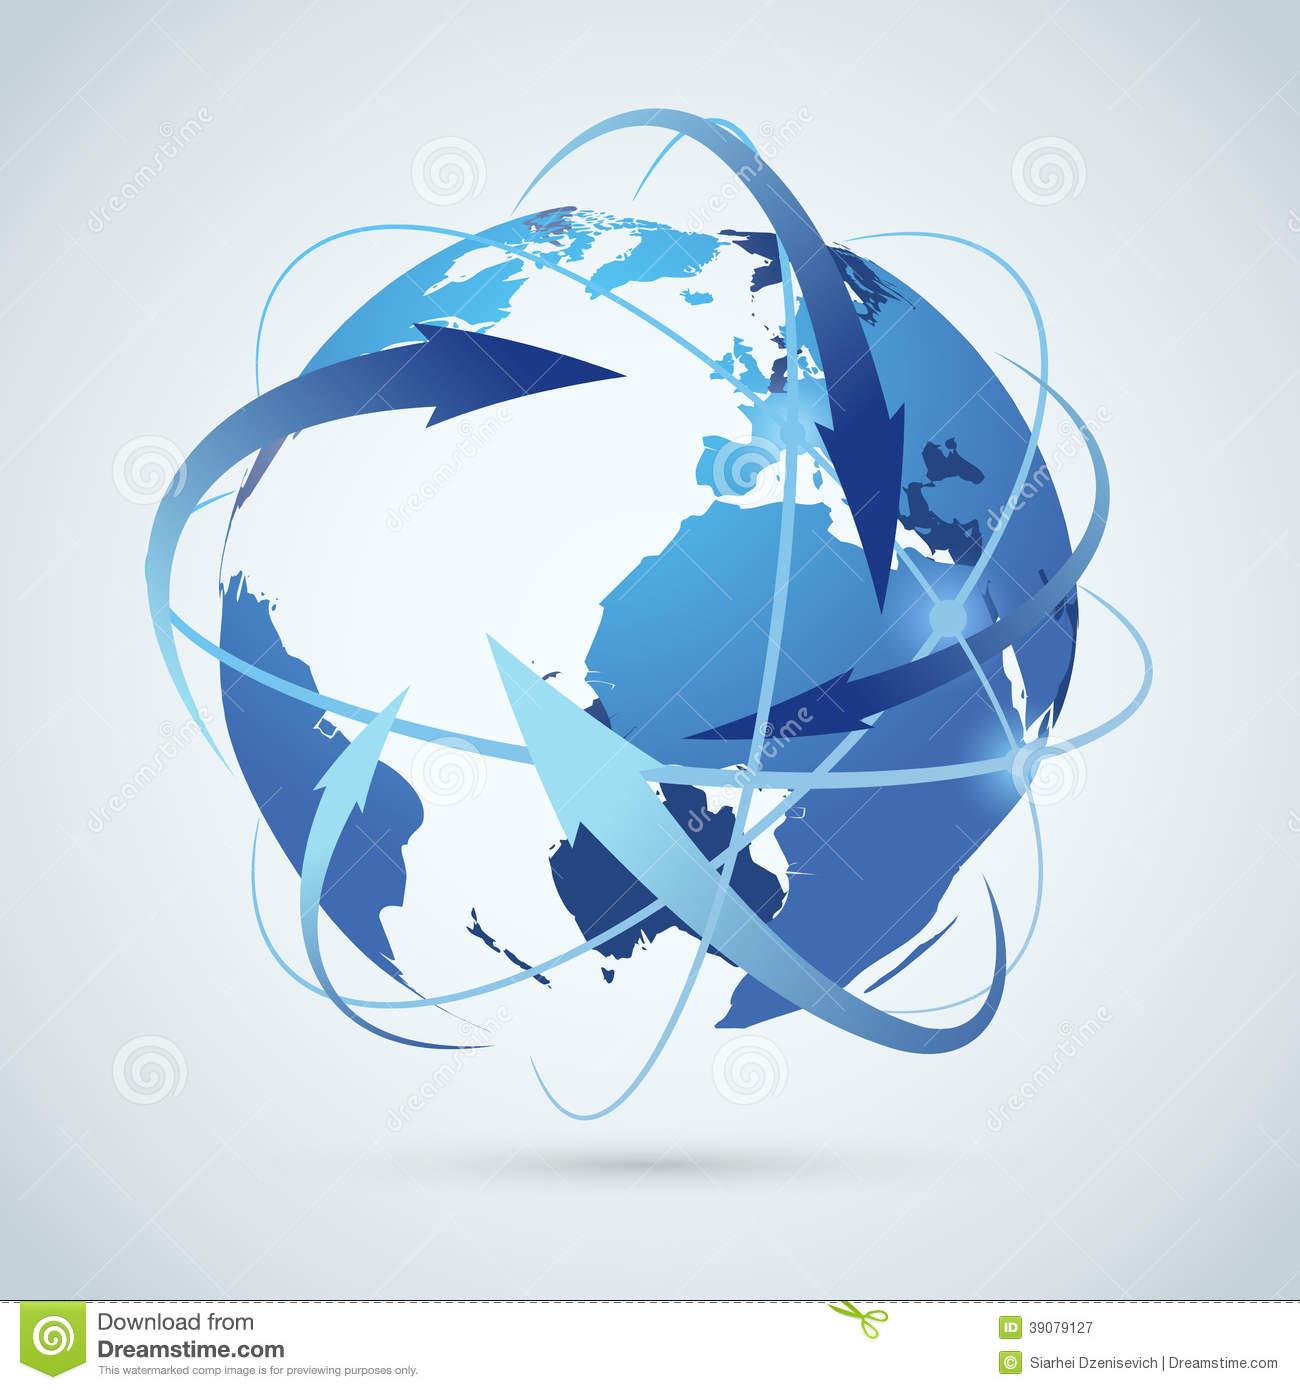 Global Business Idea.